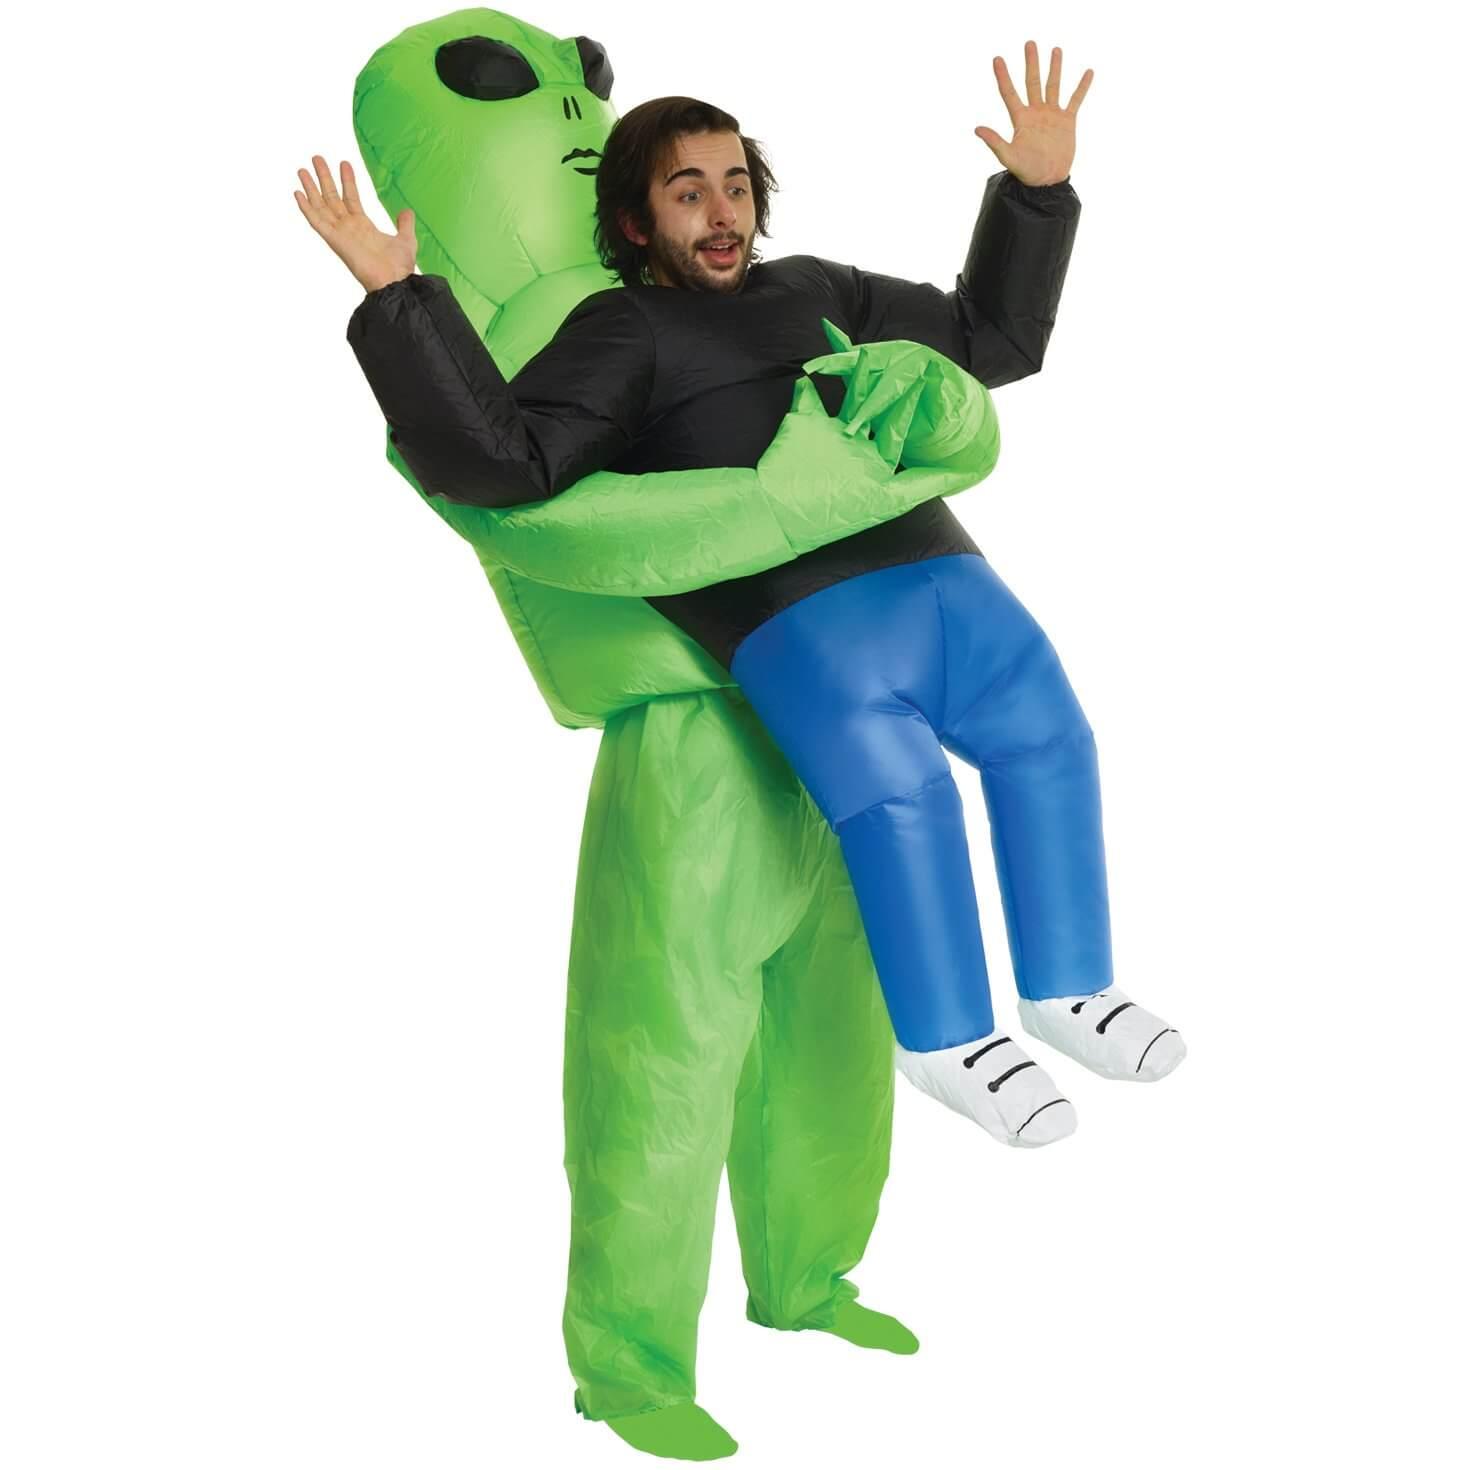 Disfraz alien moda meme inflable twitter viral barato oferta descuento mejor precio